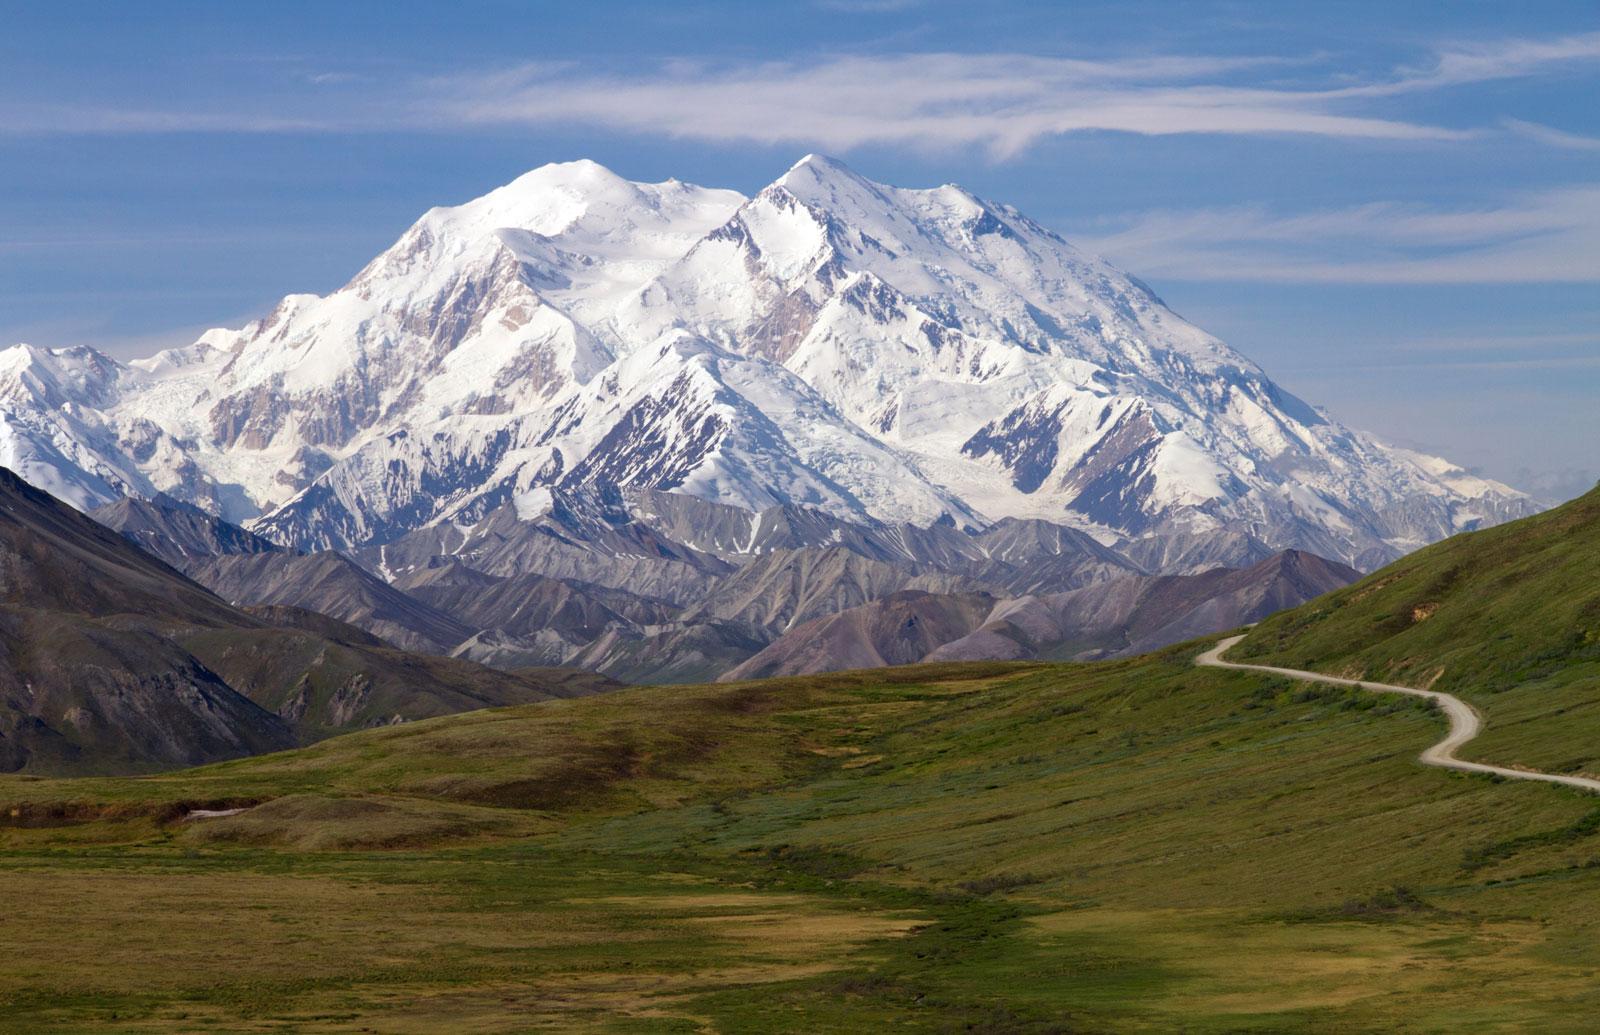 Denali McKinley 6.190m, Alaska.